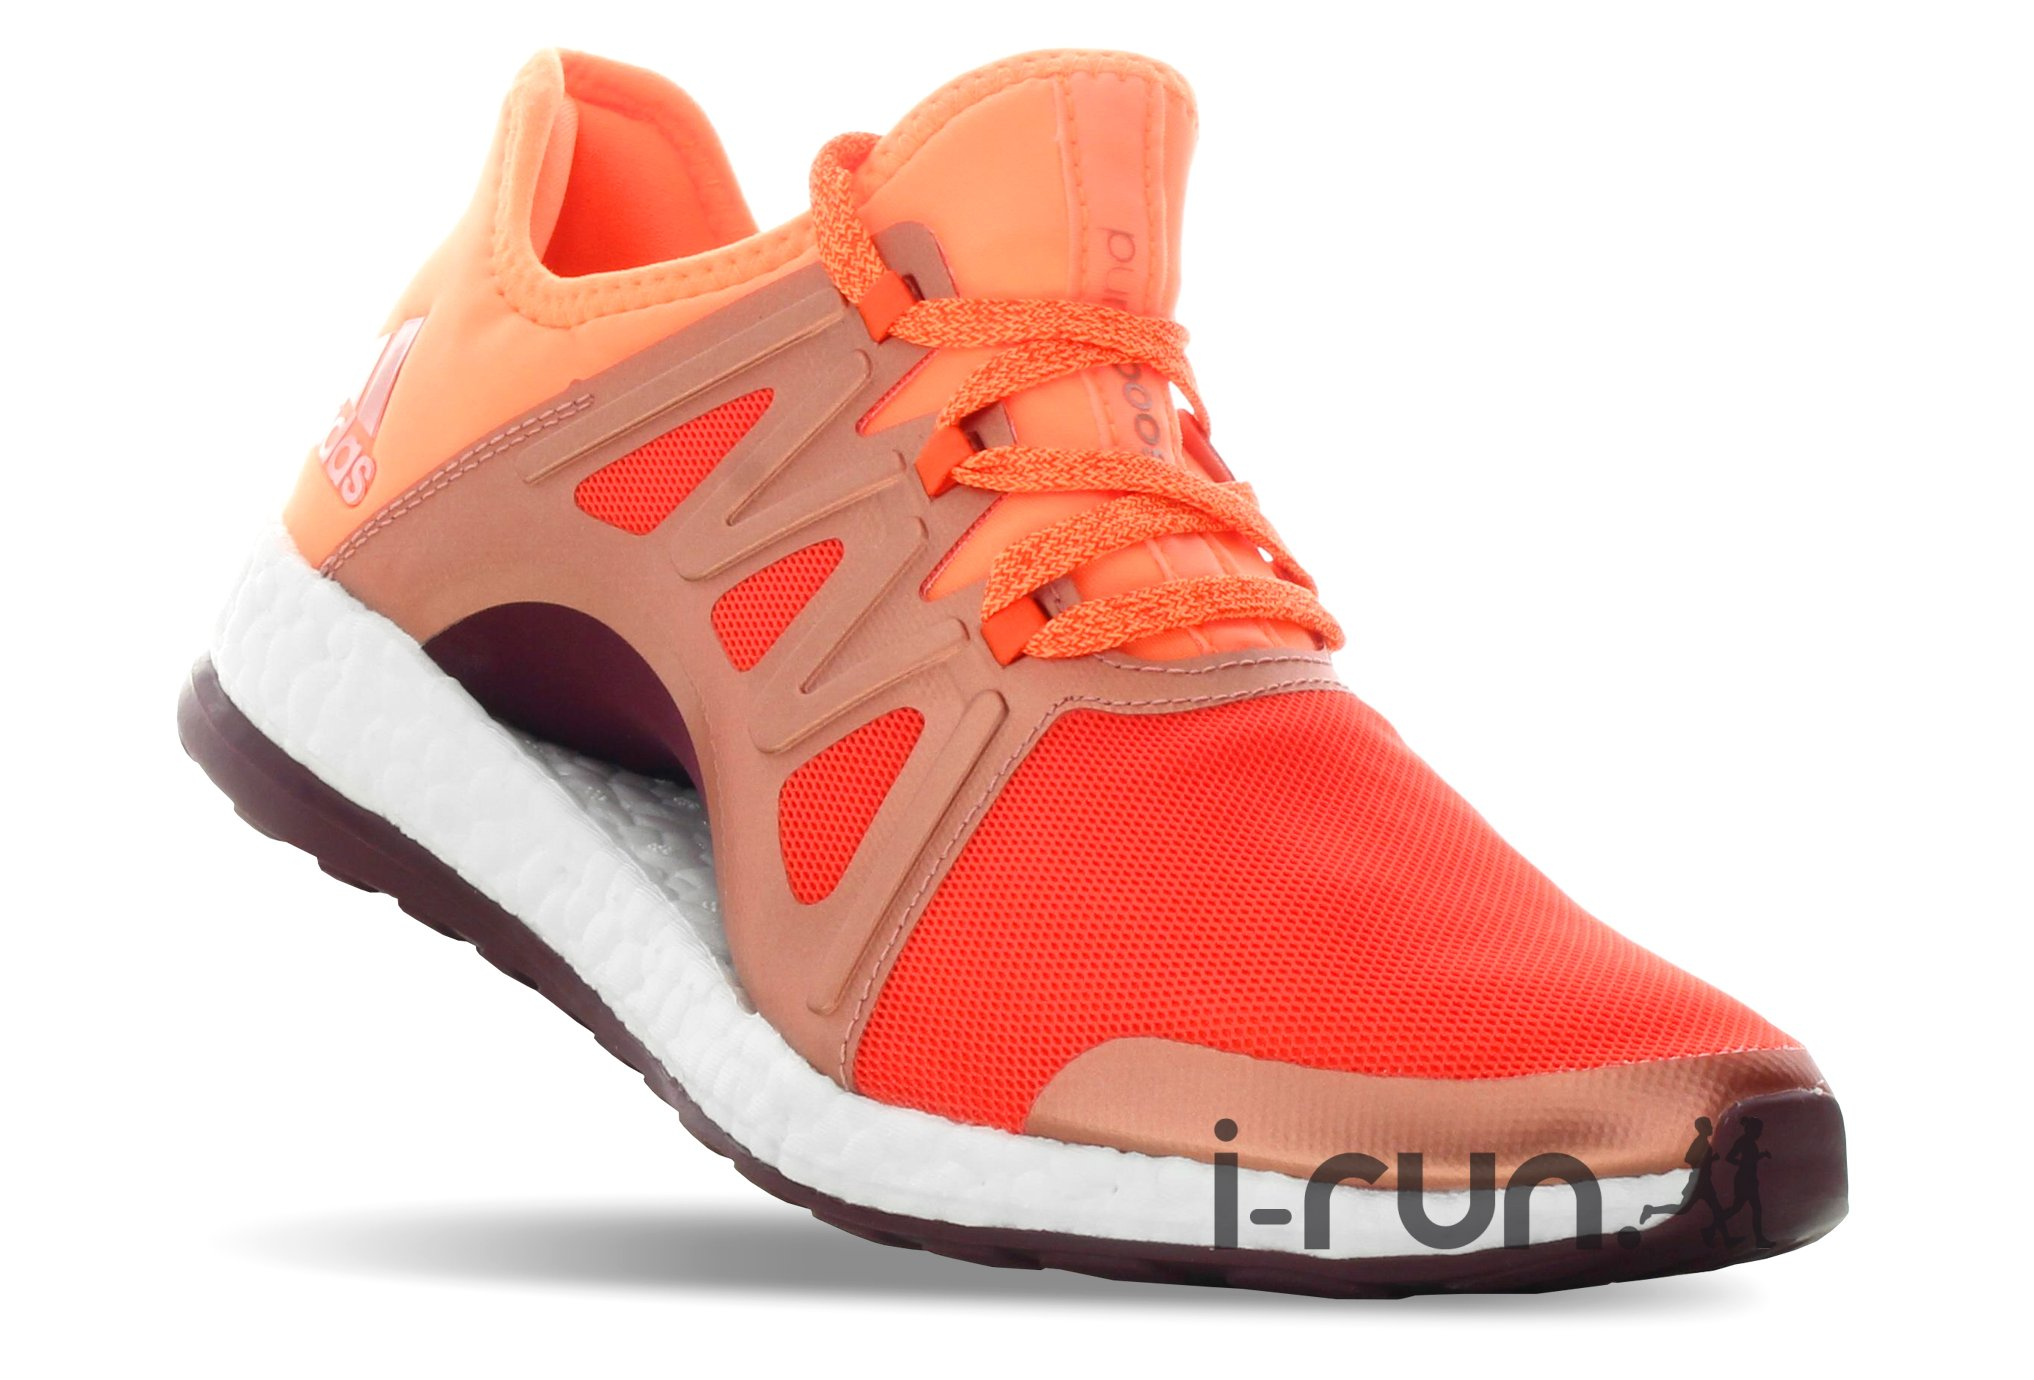 Adidas Pureboost xpose w chaussures running femme